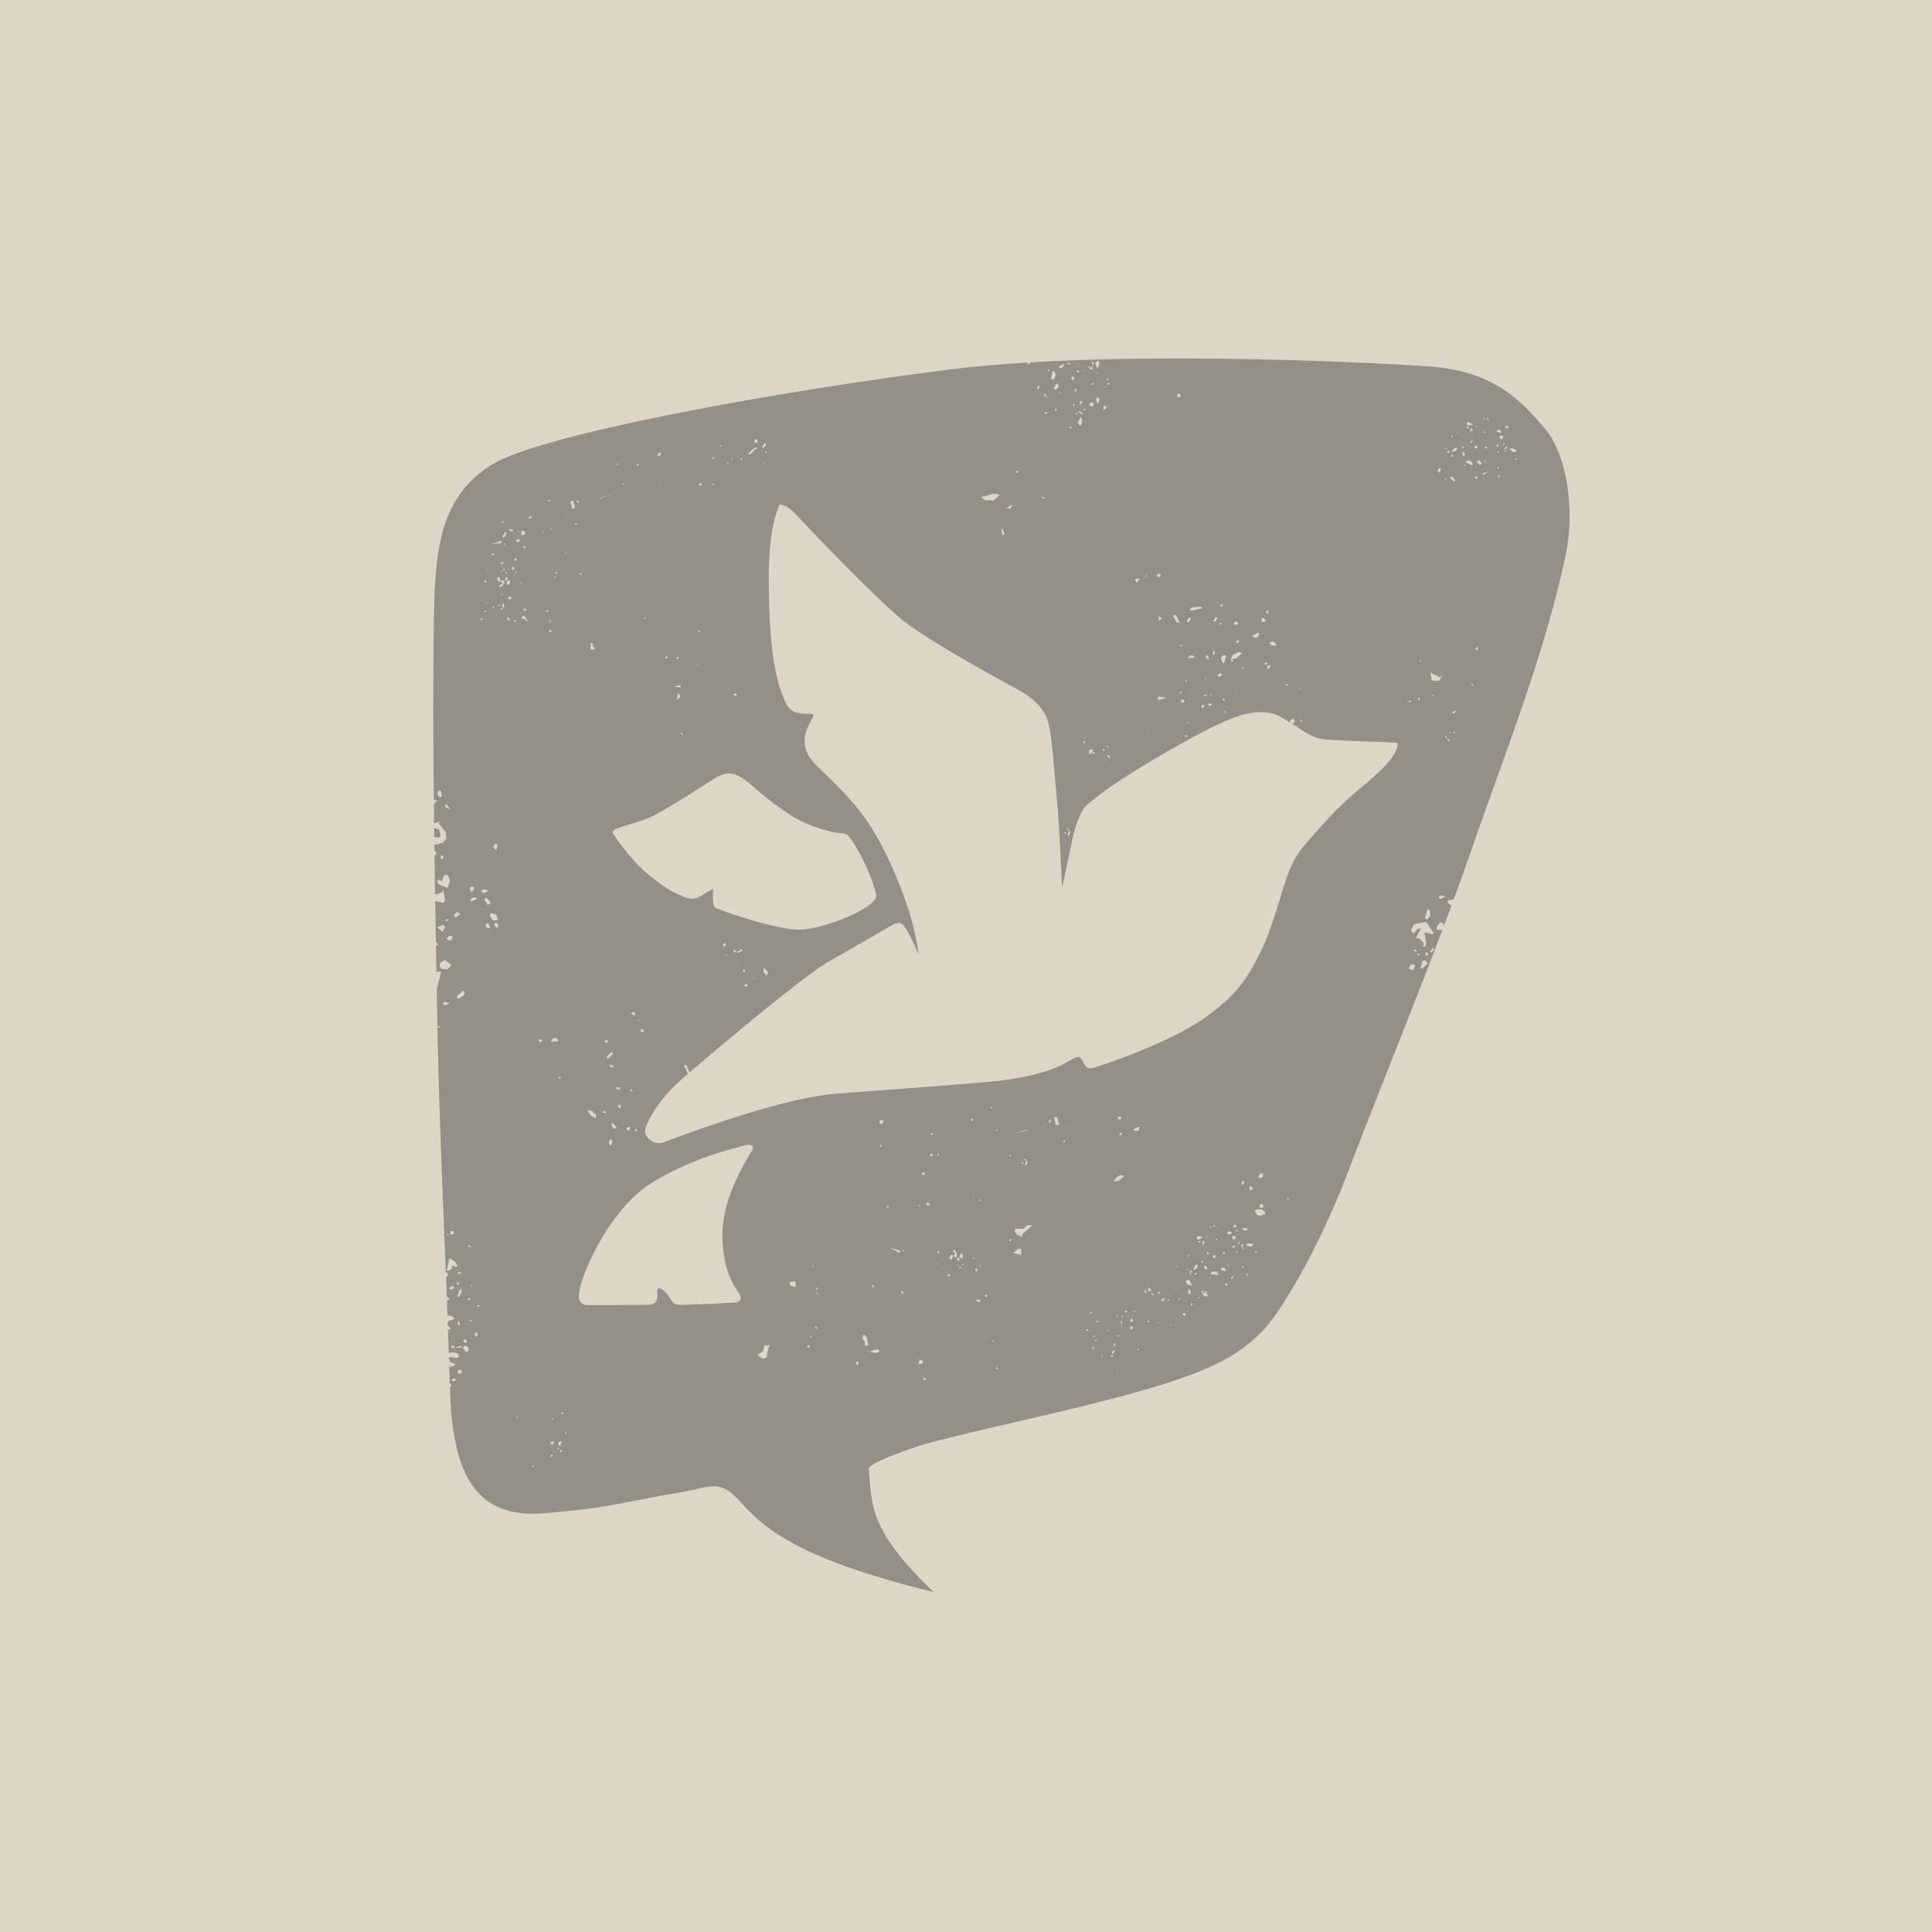 logos_0006_verbalbird.jpg